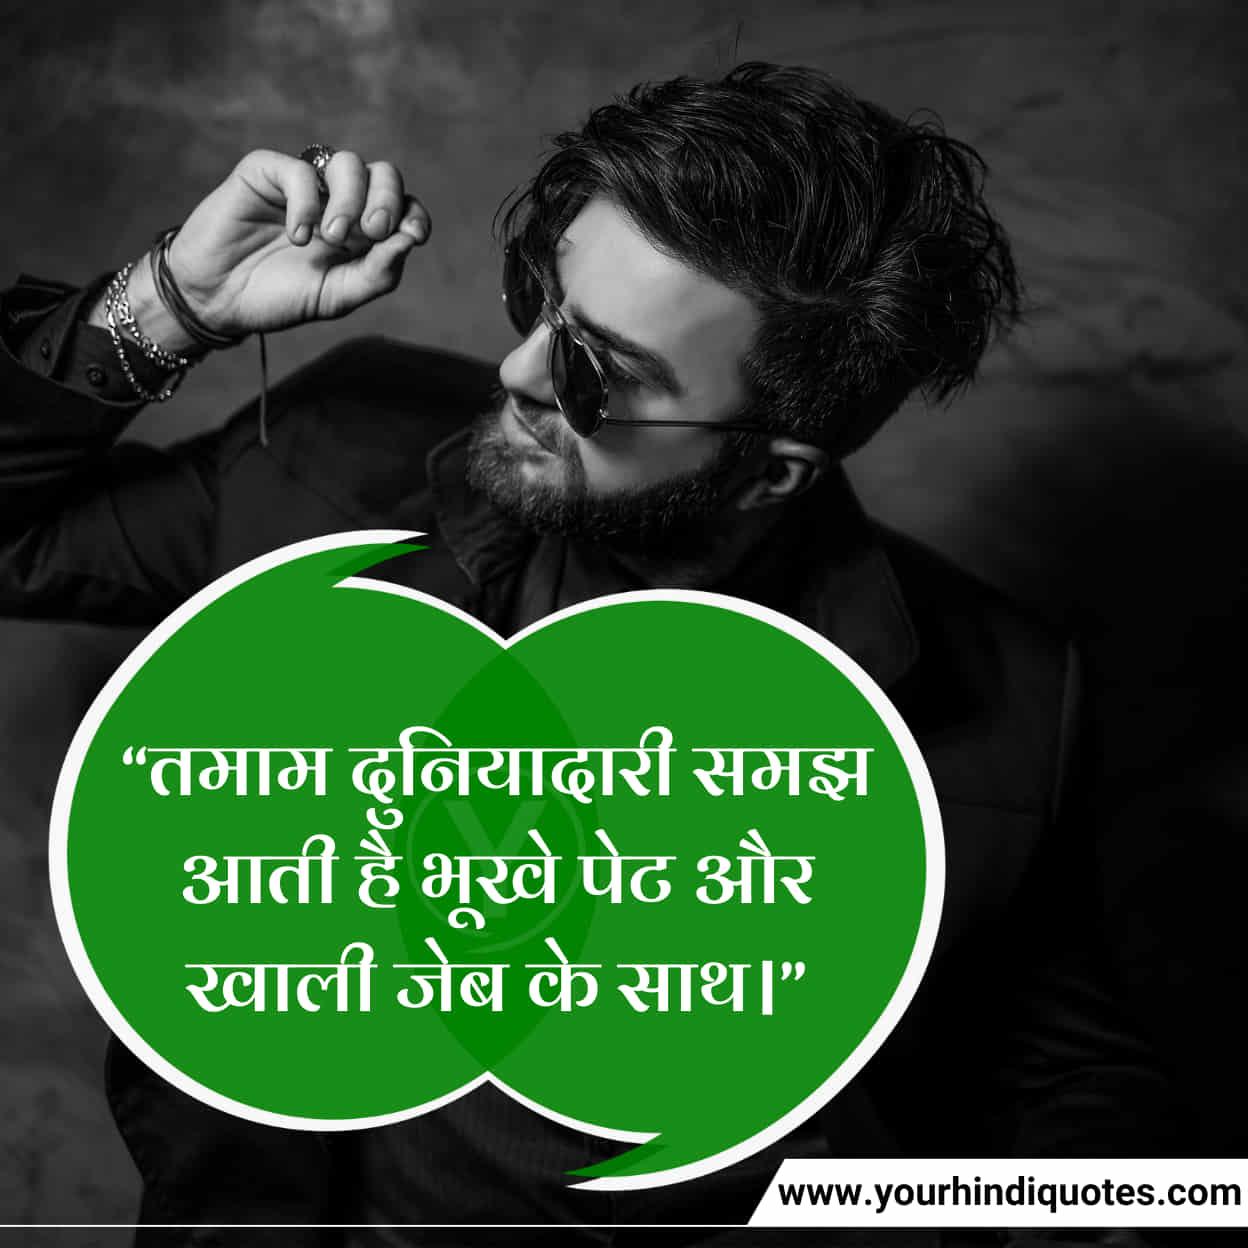 Hindi Motivational Status for Success